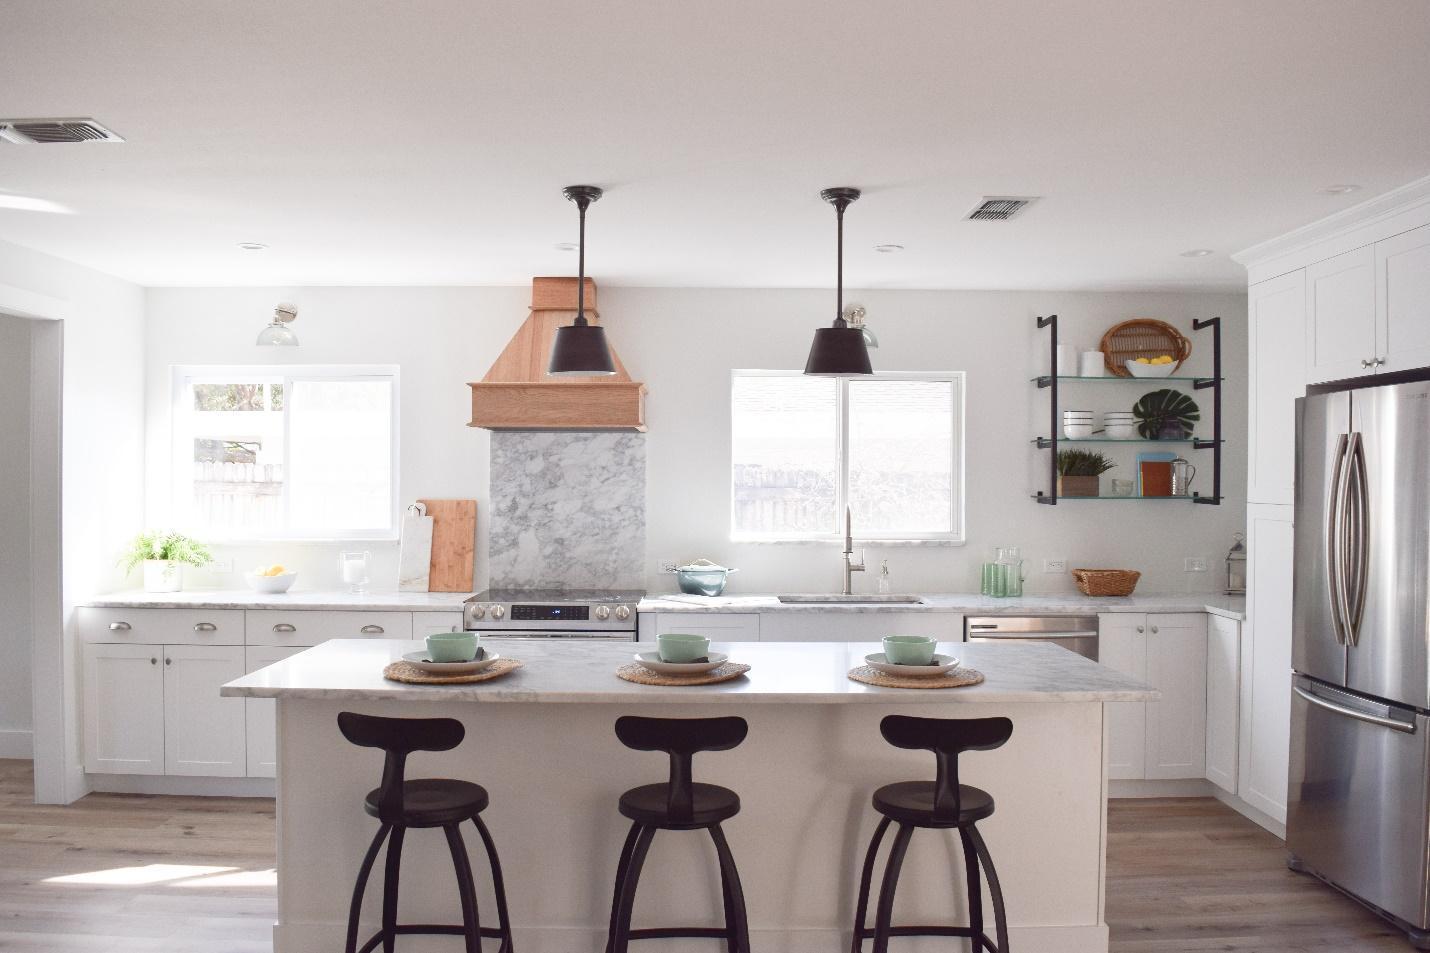 Horizon White Benjamin Moore: Sarasota Florida Interior Design, The Best White Paint Colors